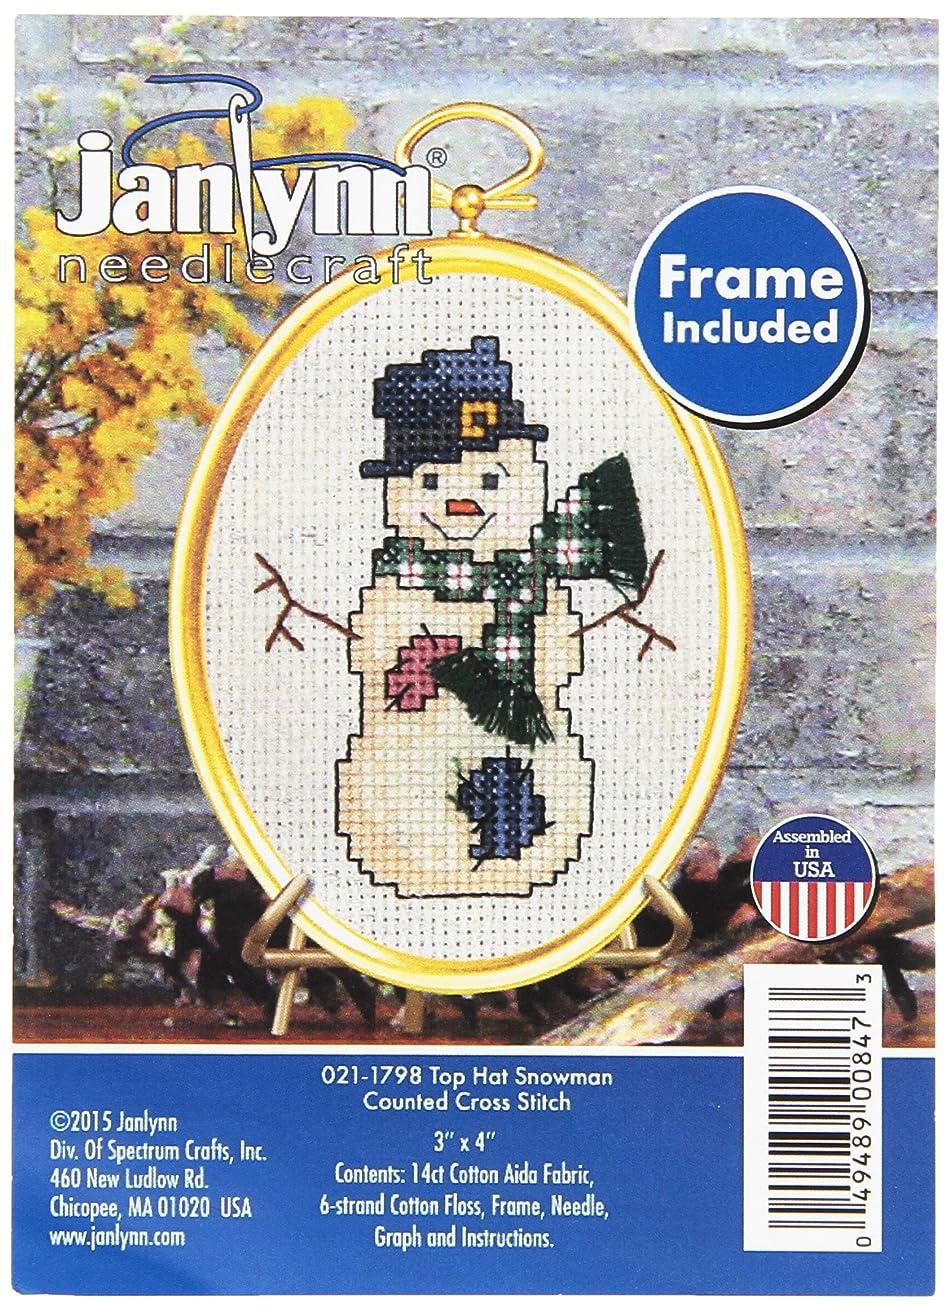 Janlynn 14 Count Top Hat Snowman Mini Counted Cross Stitch Kit, 3